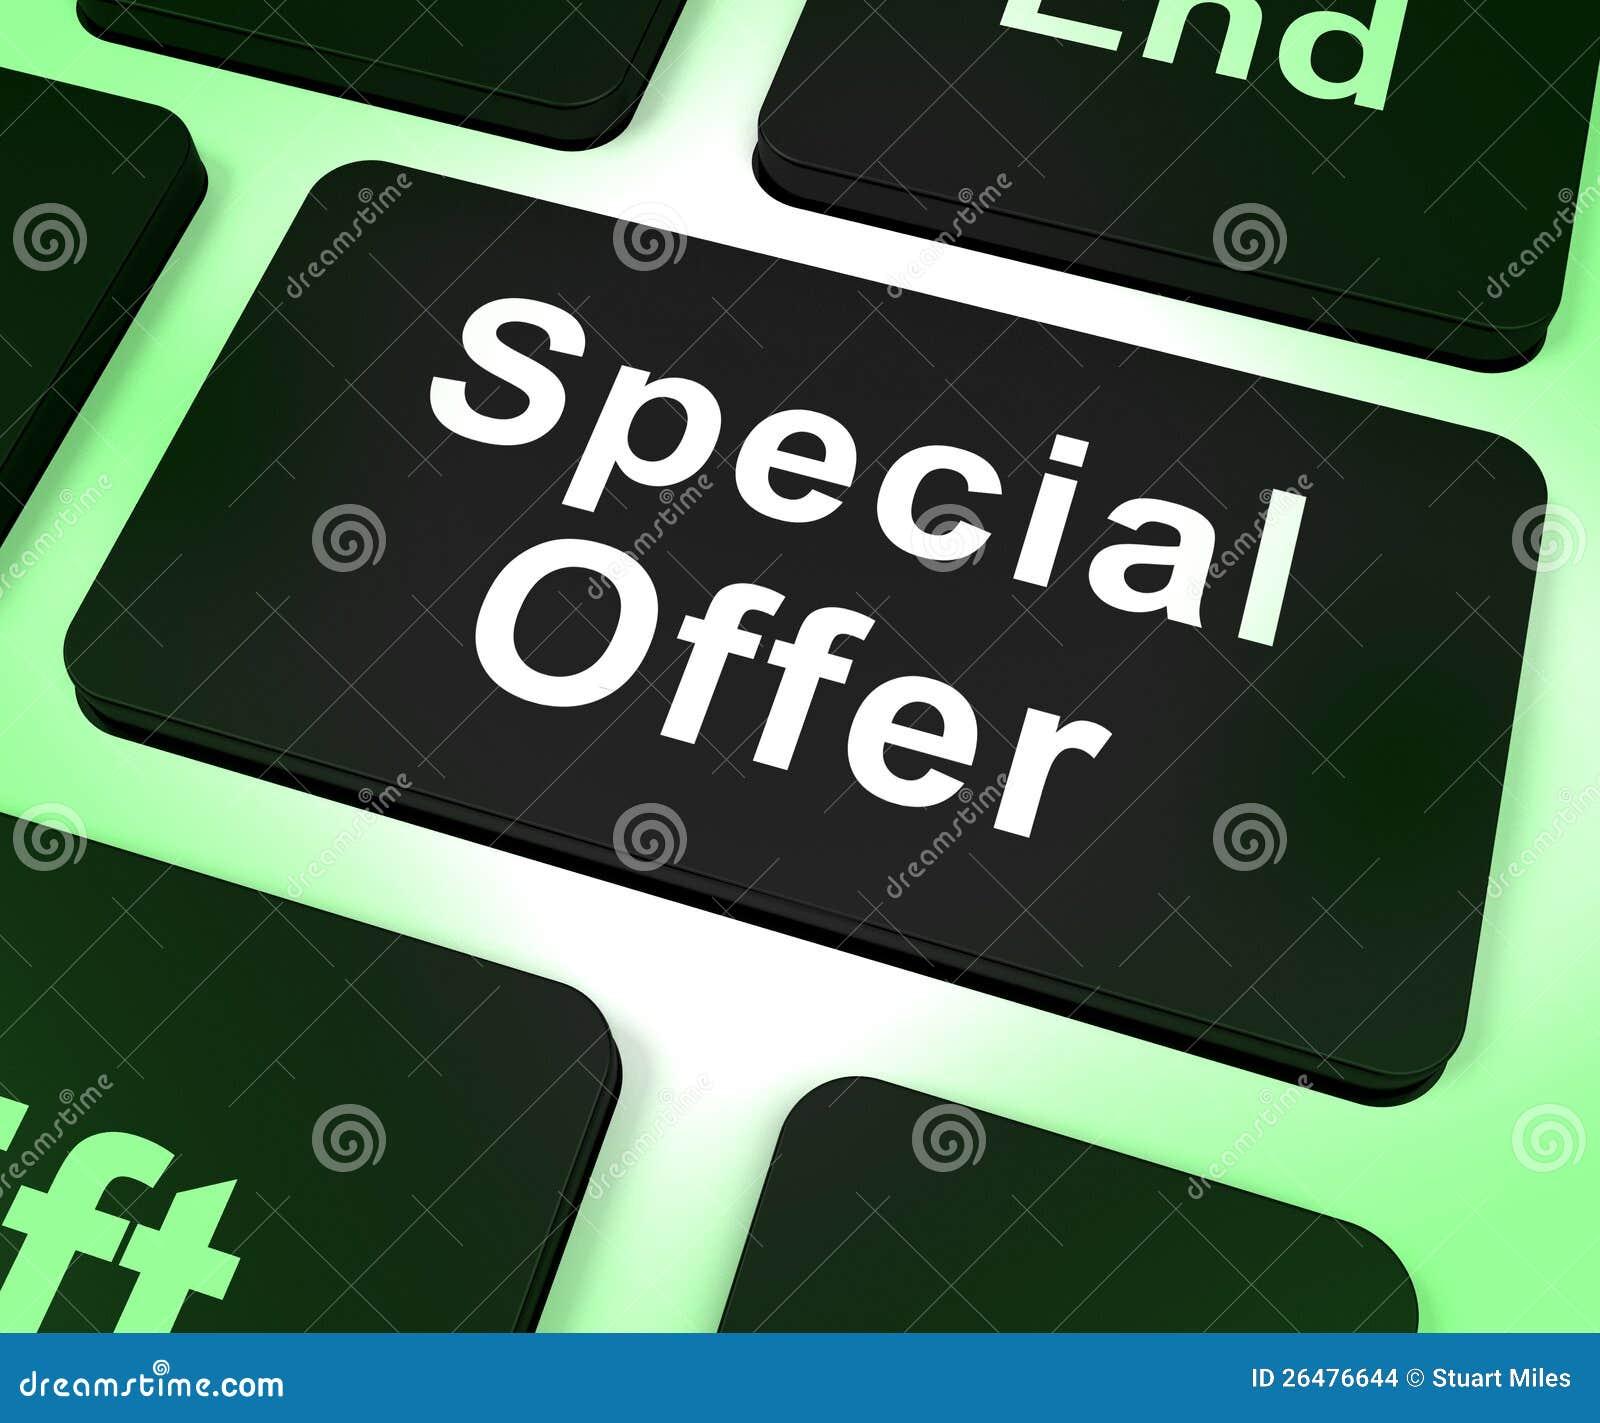 special offer computer key shows discount stock images image 26476644. Black Bedroom Furniture Sets. Home Design Ideas